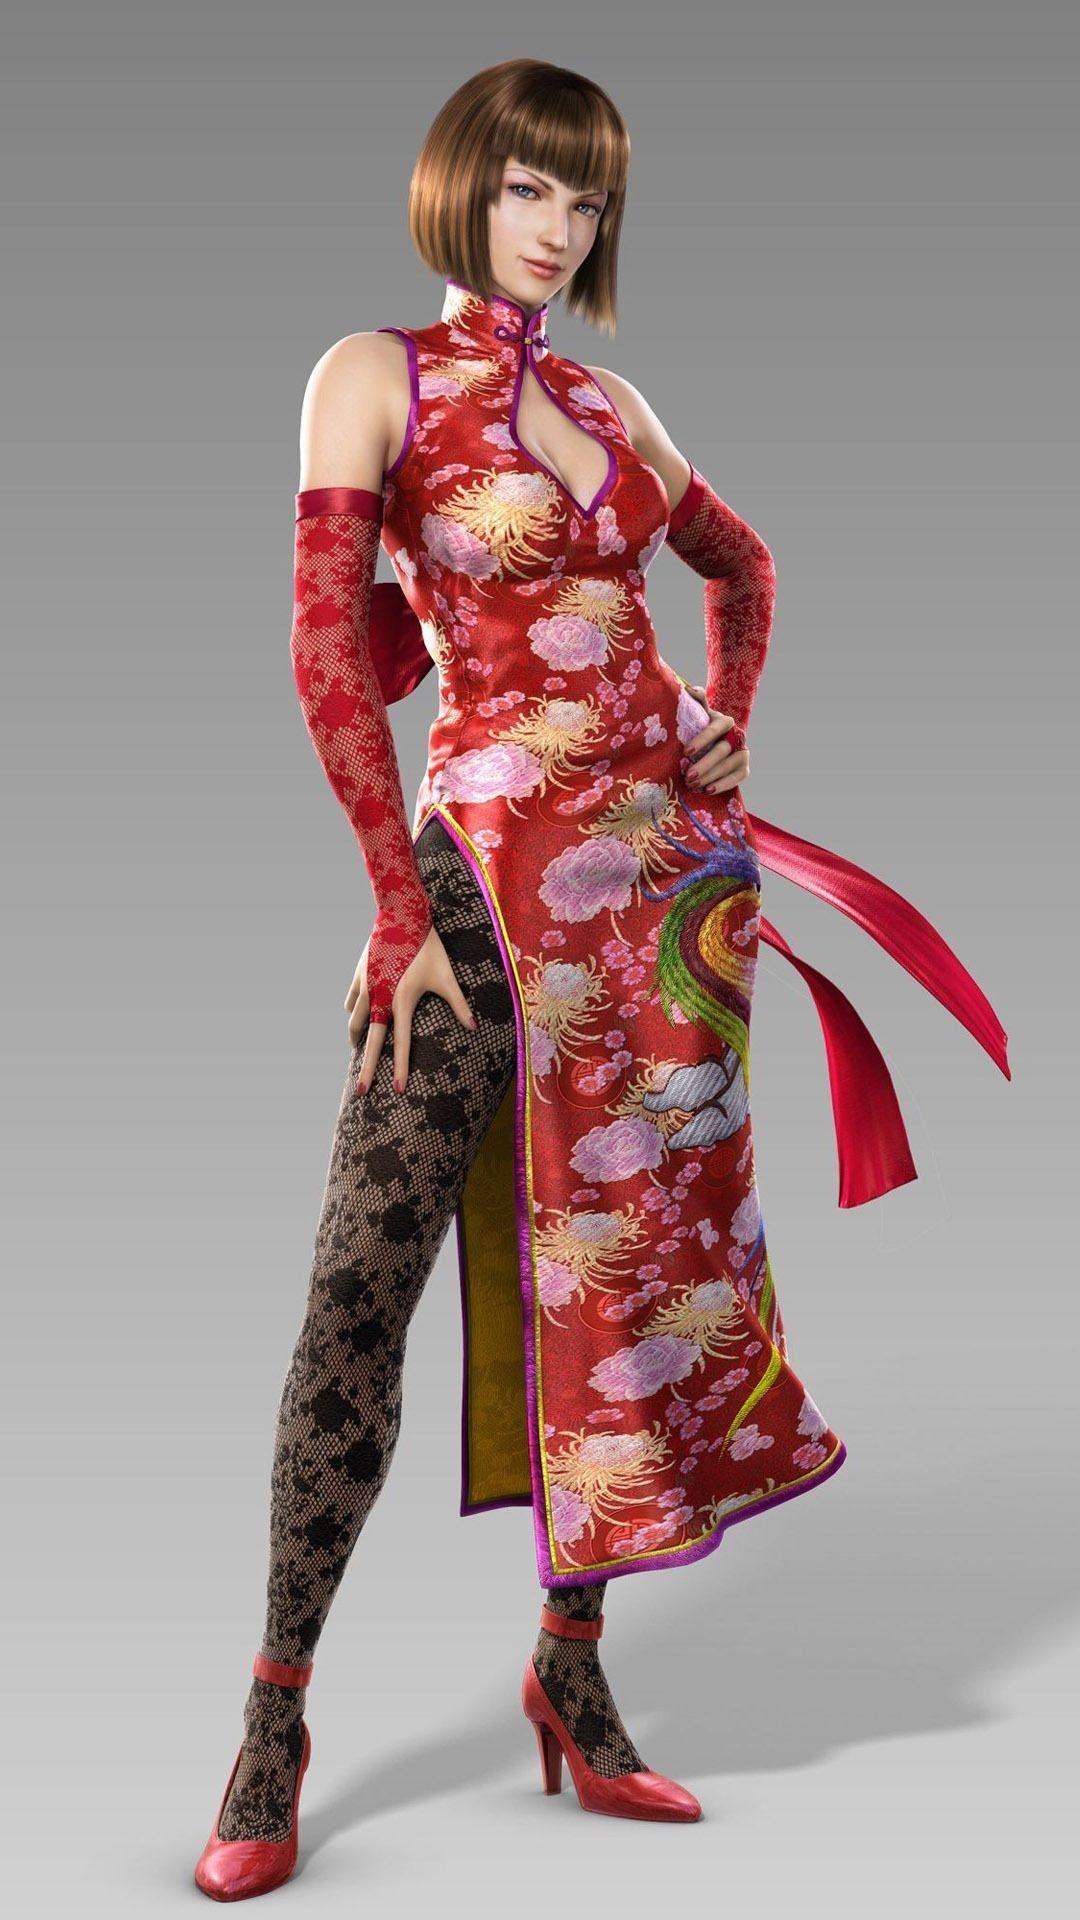 Image Result For Nina Williams Tekken 7 Costumes Tekken Girls Fantasias Jogos De Luta